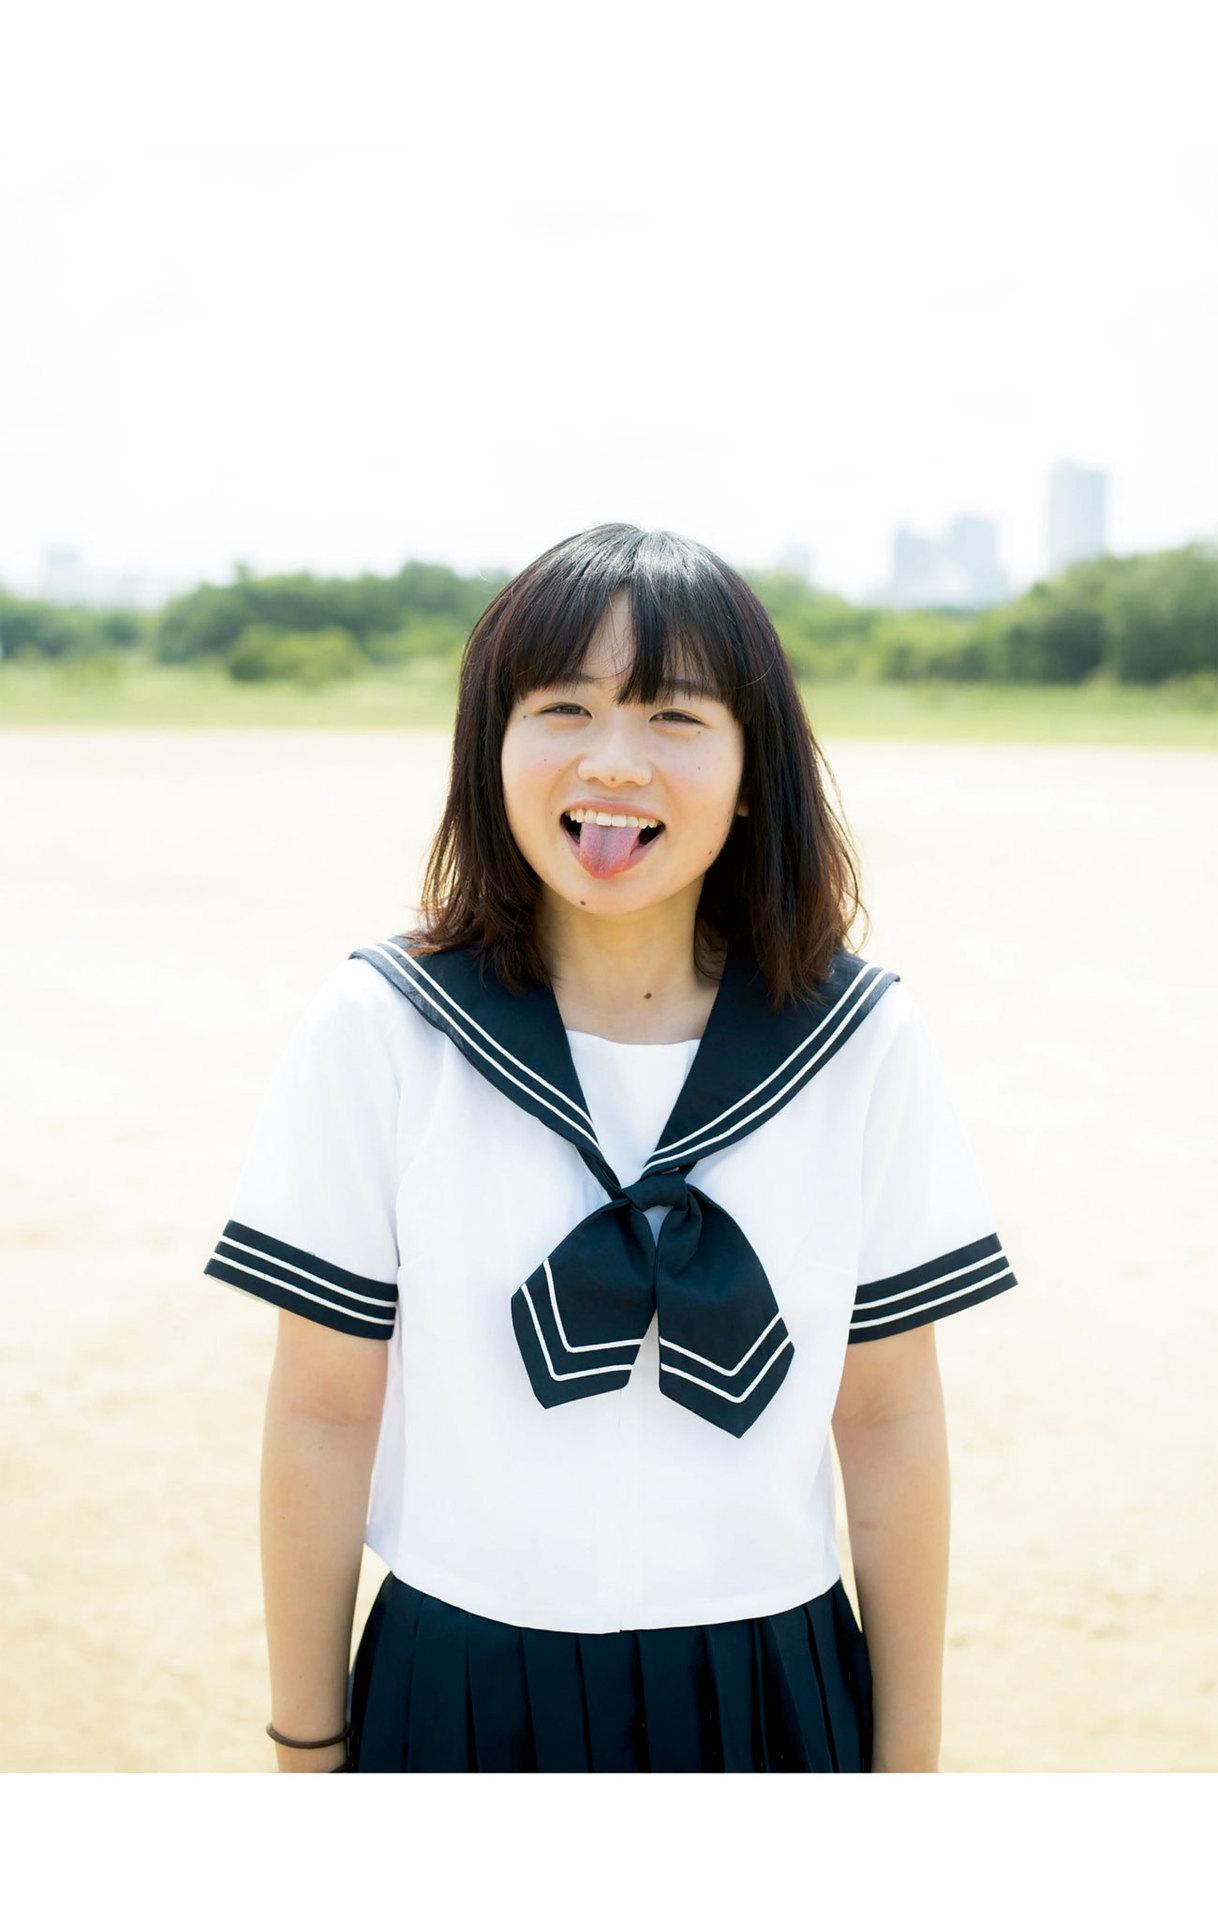 Summer Vacation Uniform After School Youth Bikini040